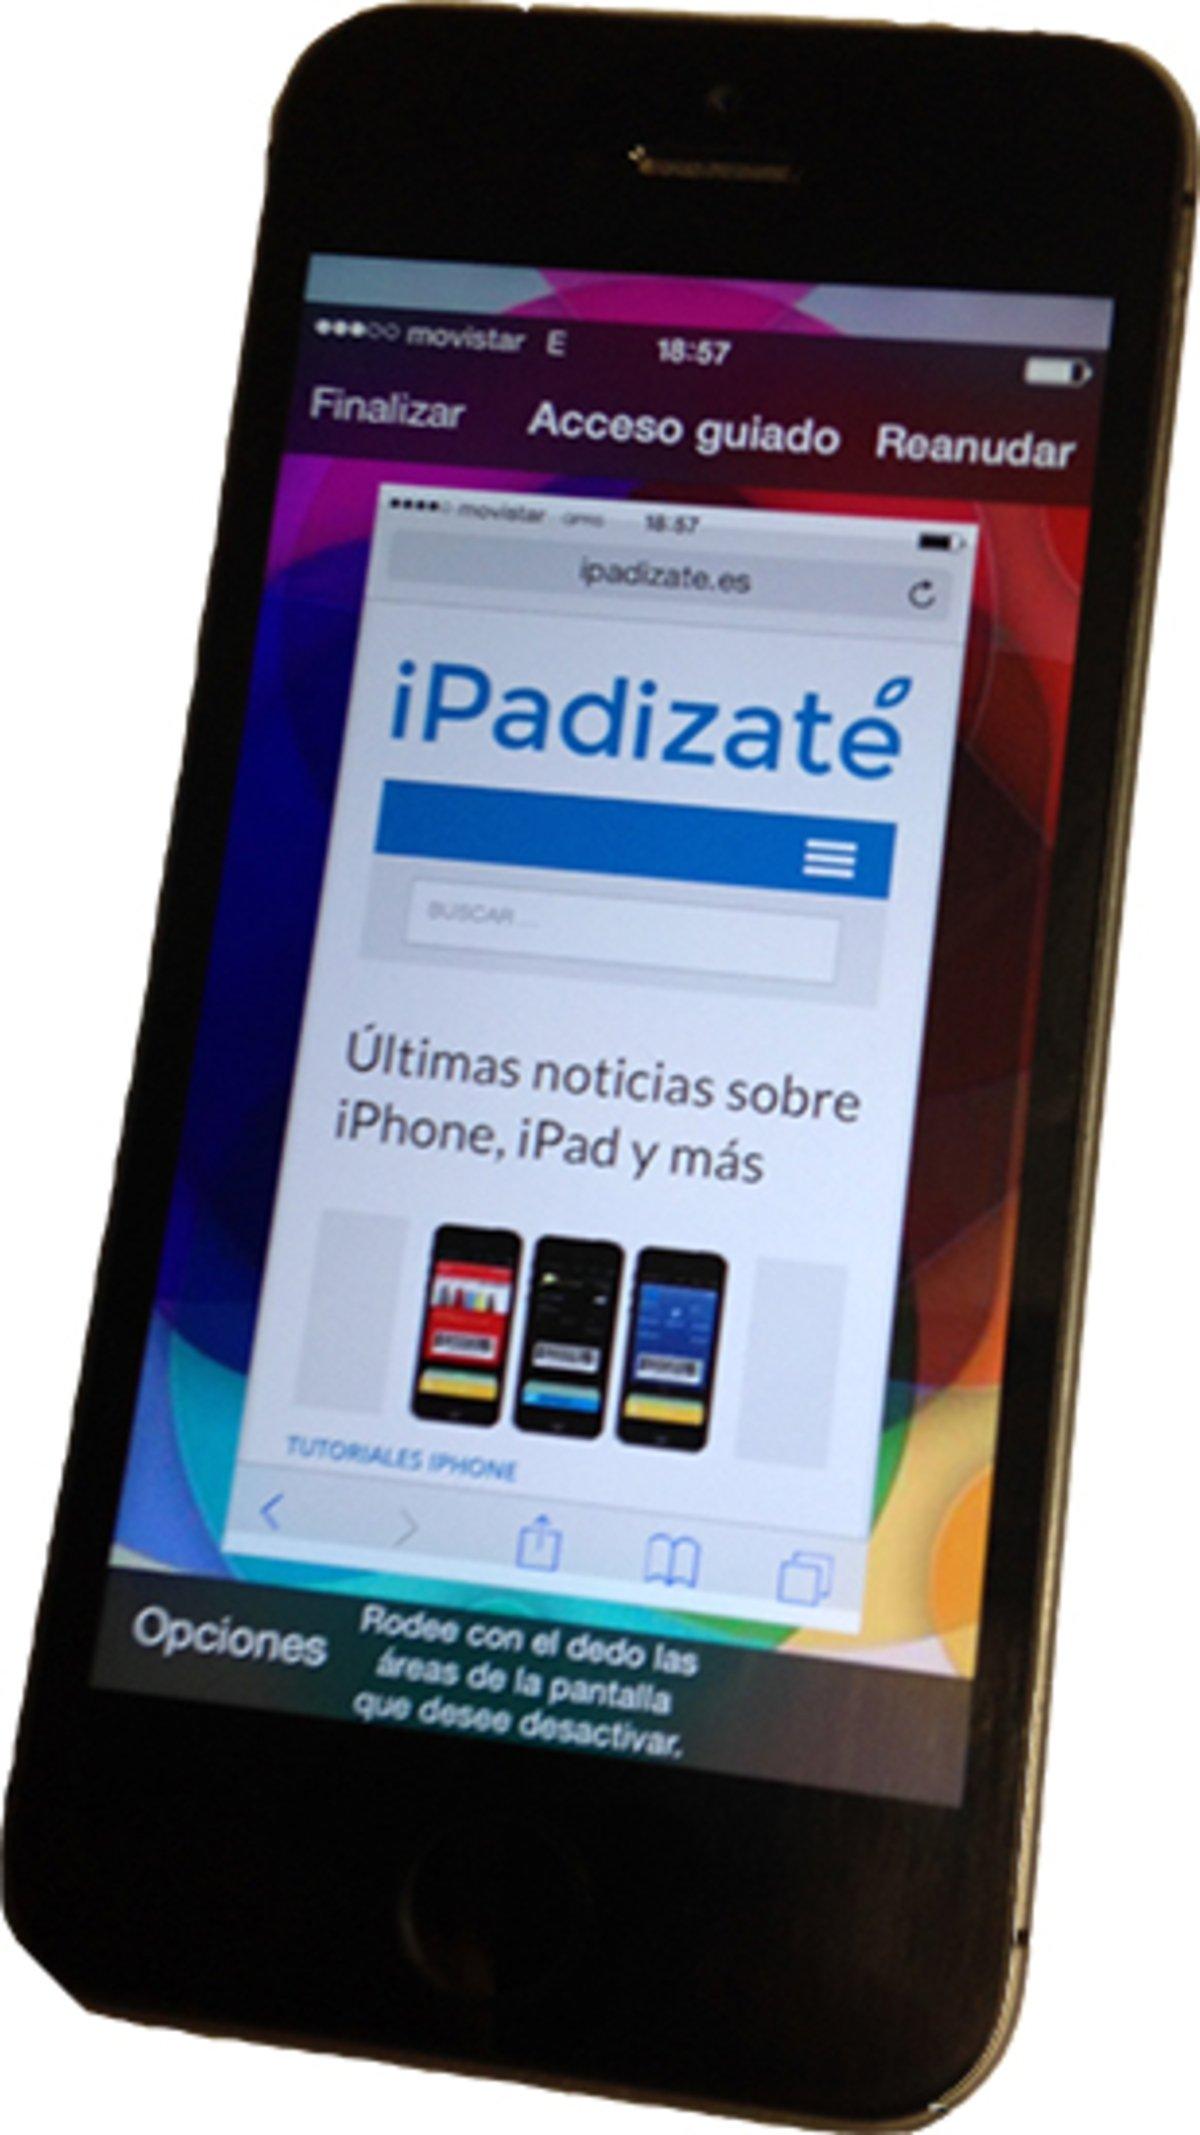 bloquear-aplicacion-ipad-iphone-5